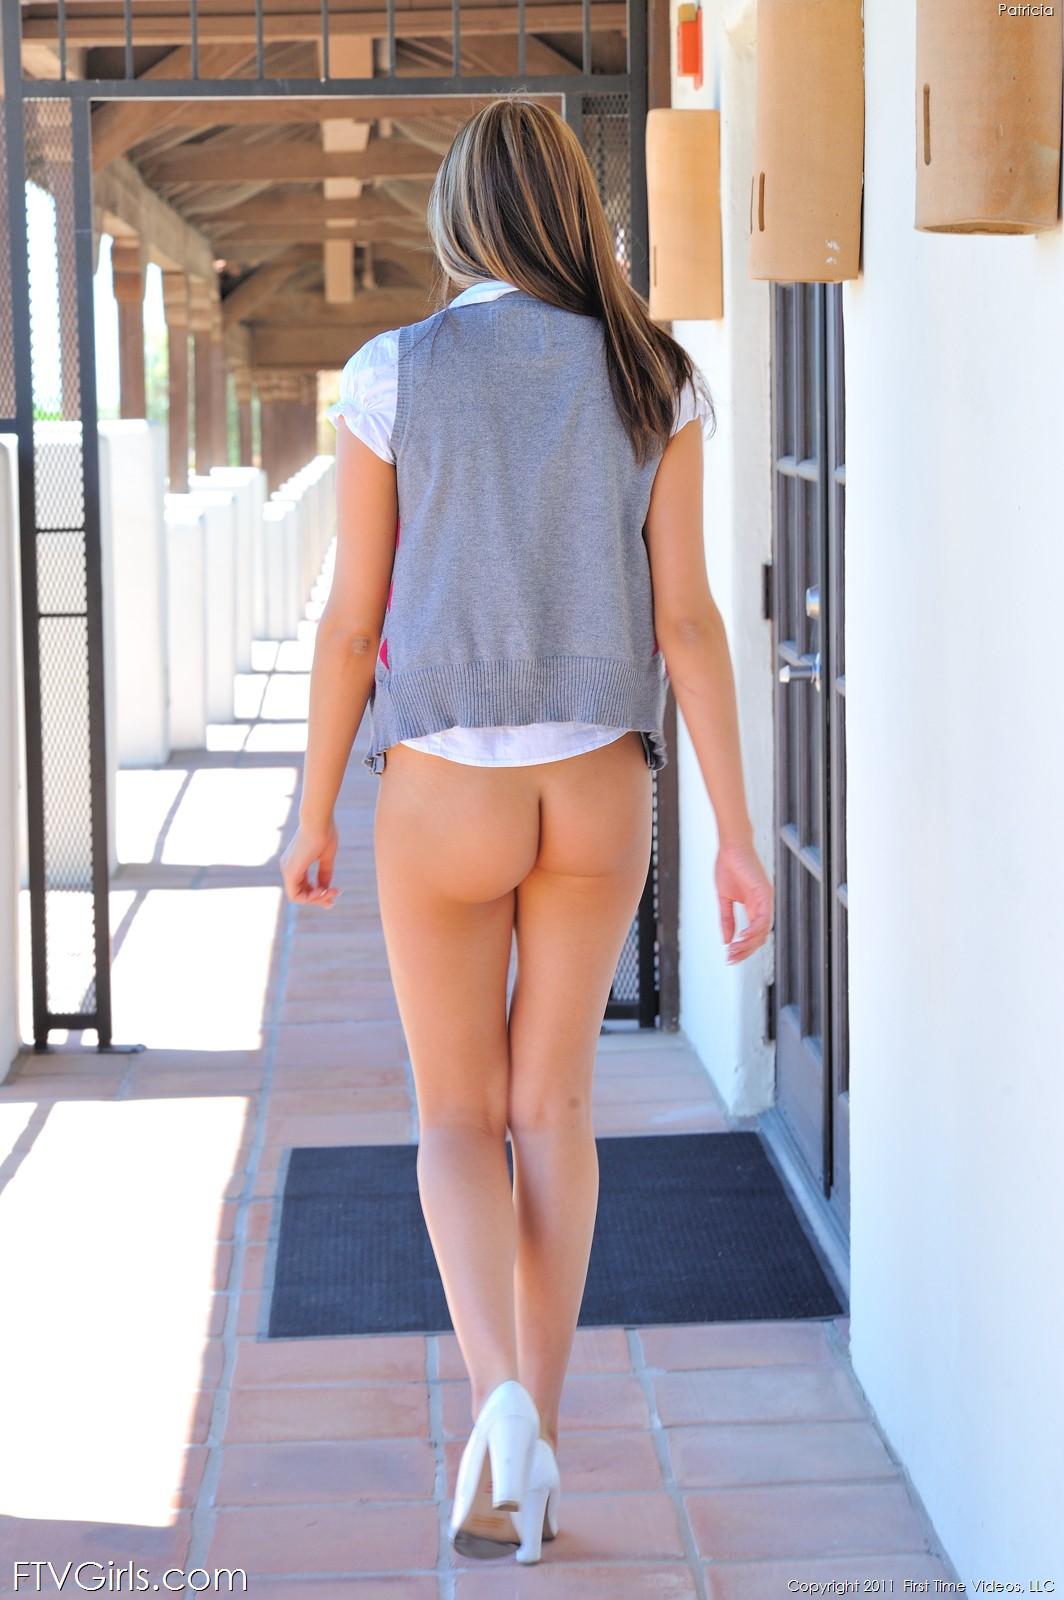 sex playboy models nude orgasms